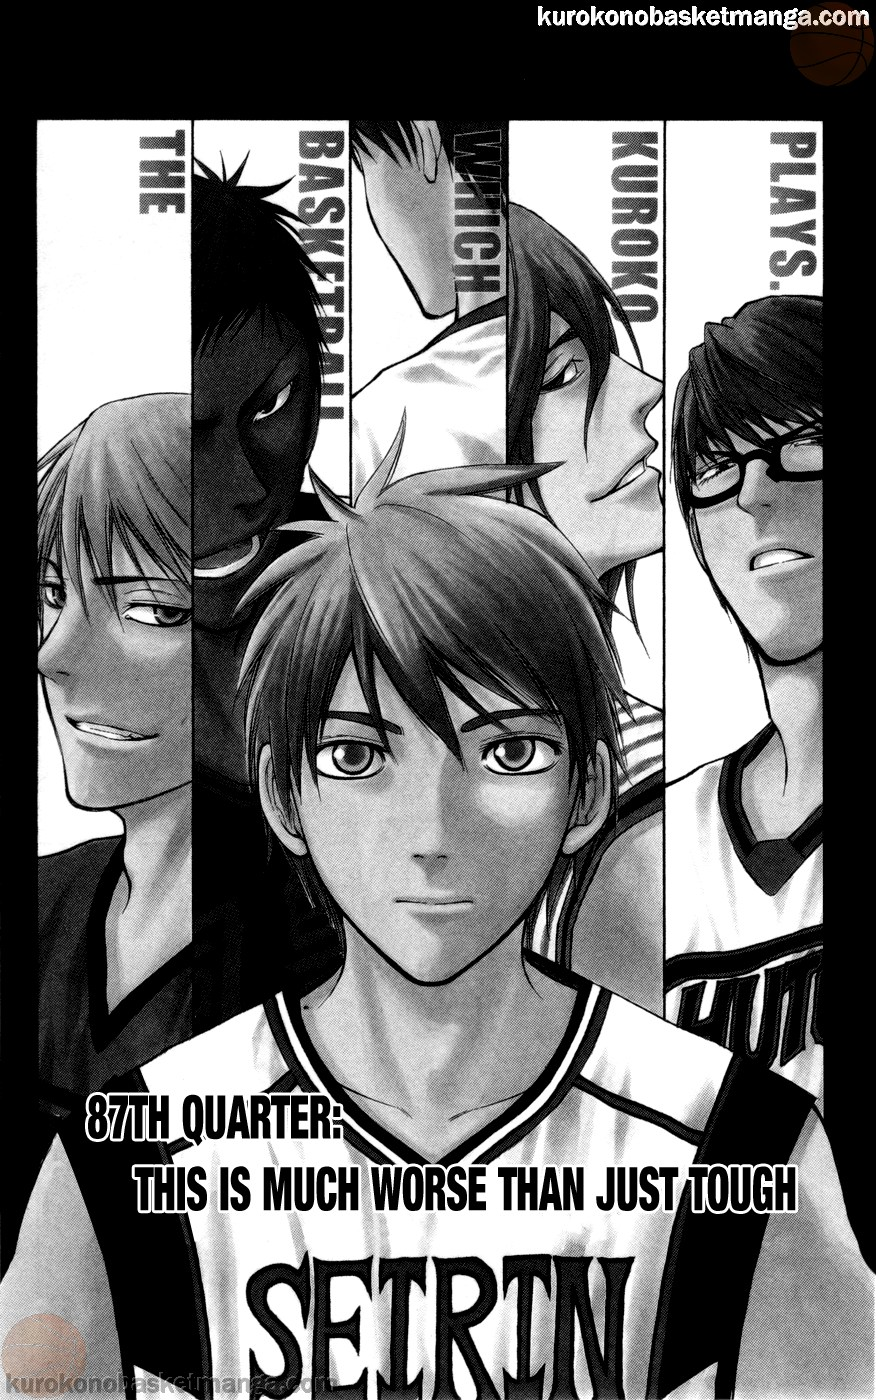 Kuroko no Basket Manga Chapter 87 - Image 01